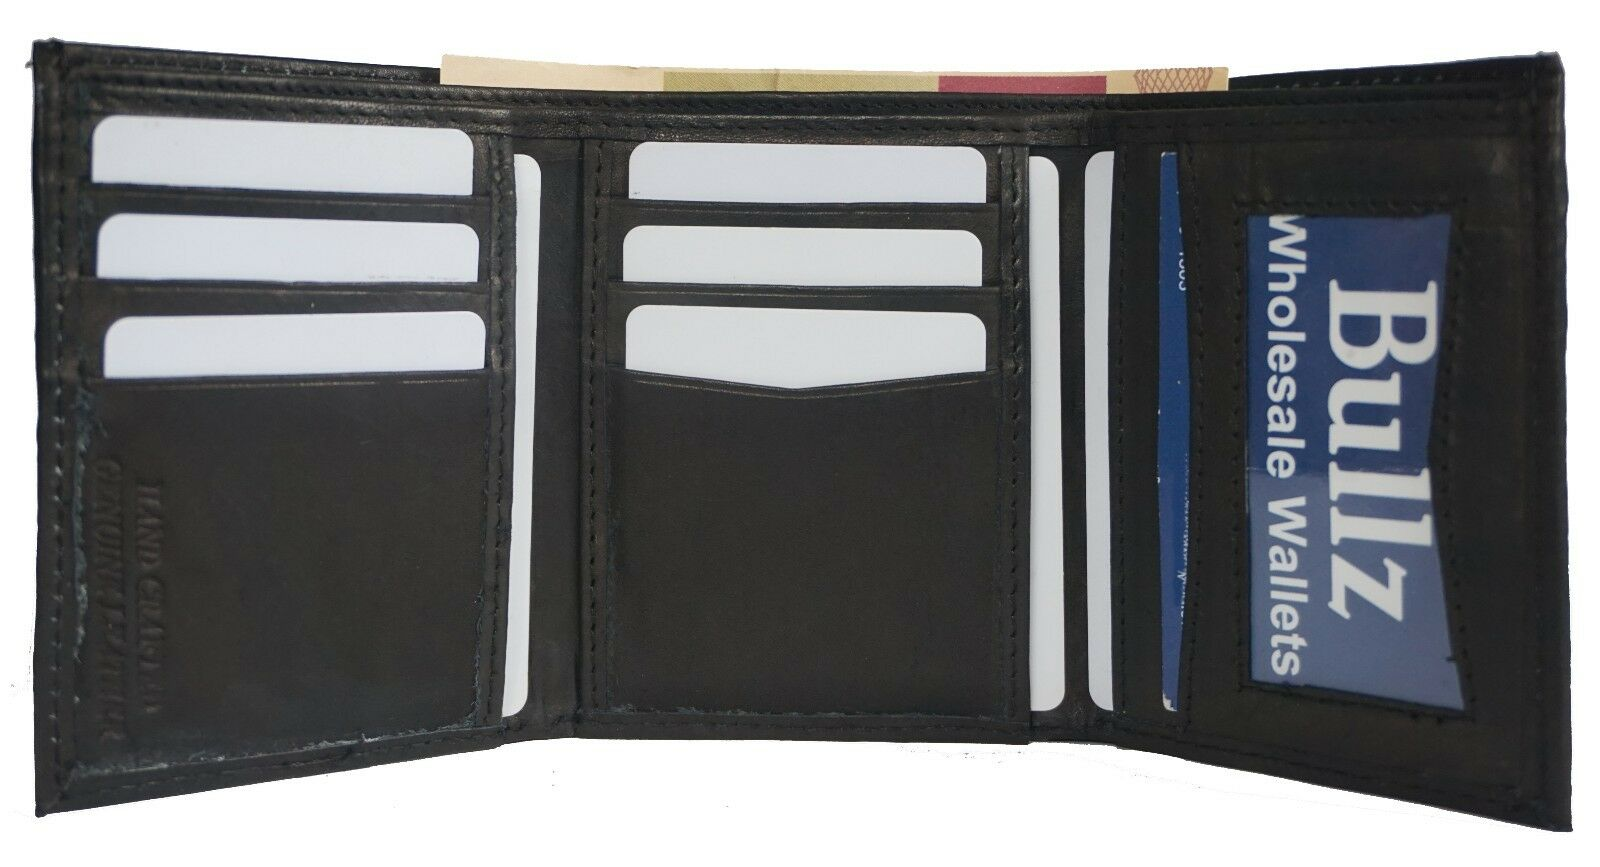 Trifold Leather Wallets for Men Credit Card- ID Holder Black-Brown-Burgundy-Tan